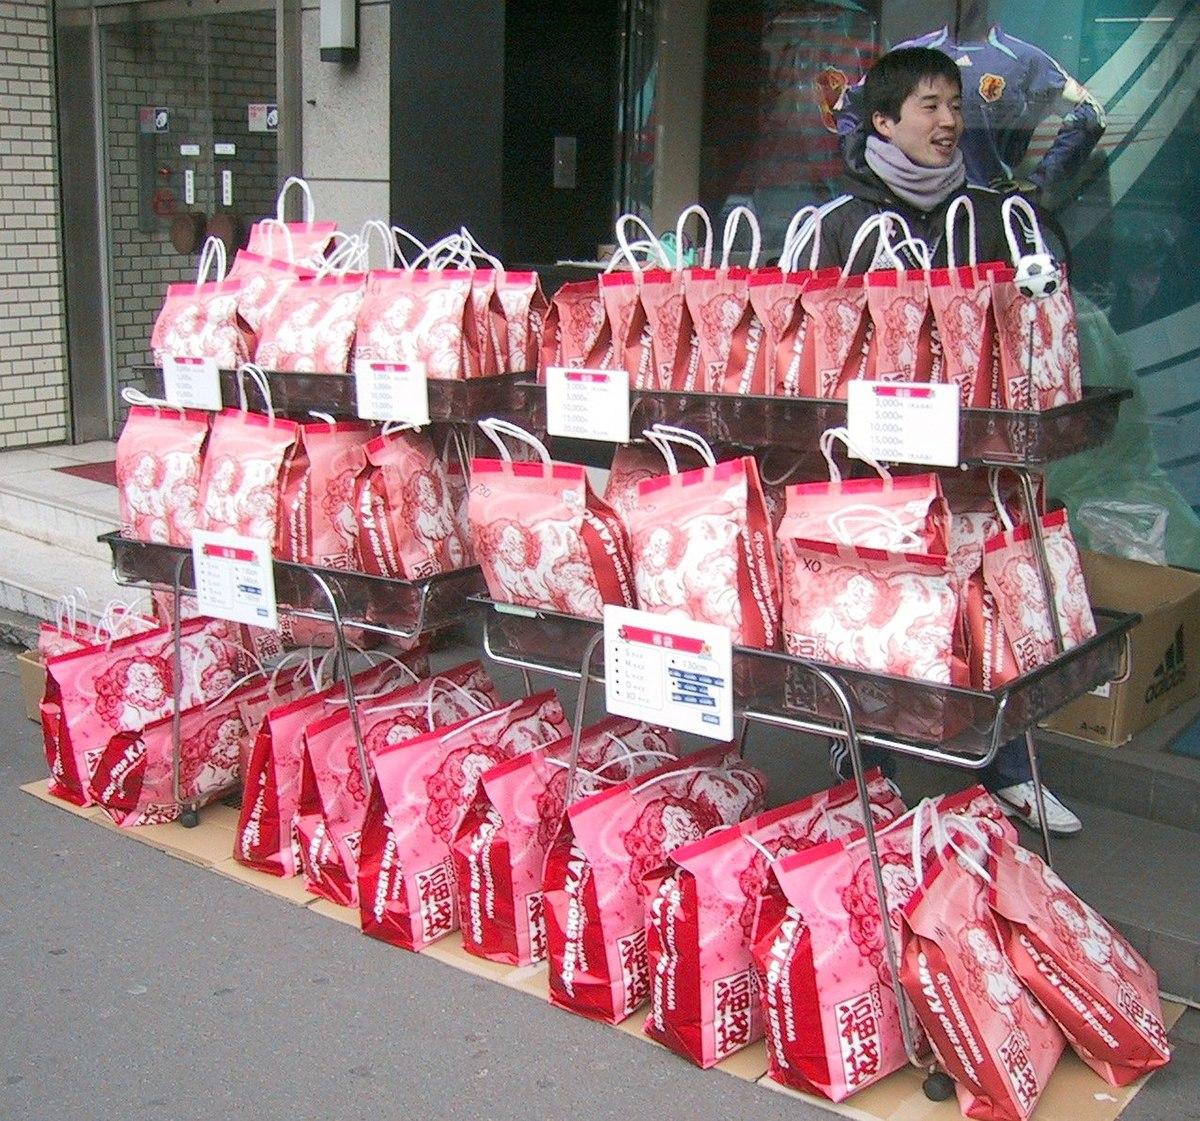 Fukubukuro Wikipedia